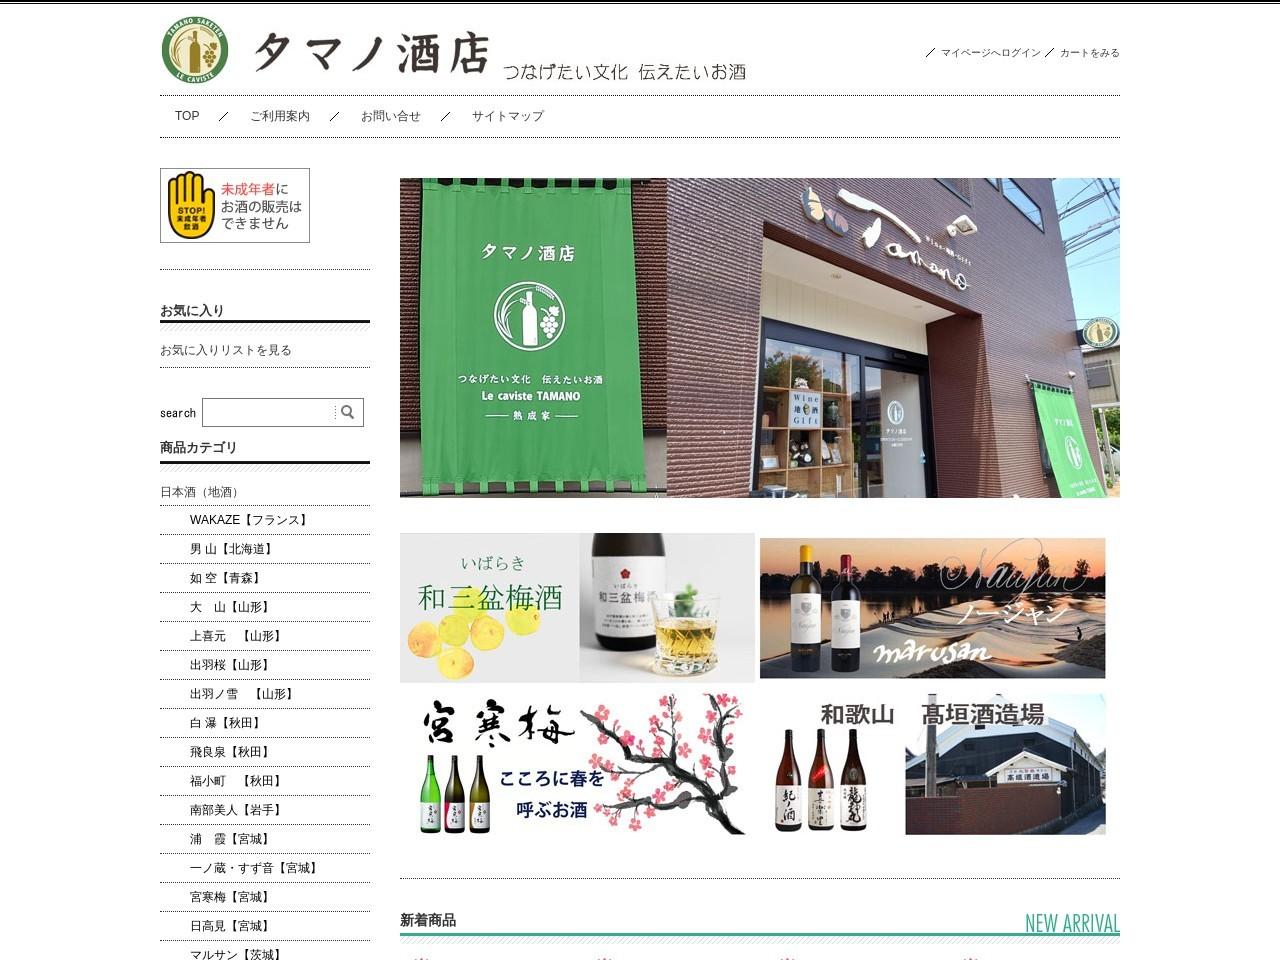 茨城県牛久市の酒専門店 タマノ酒店